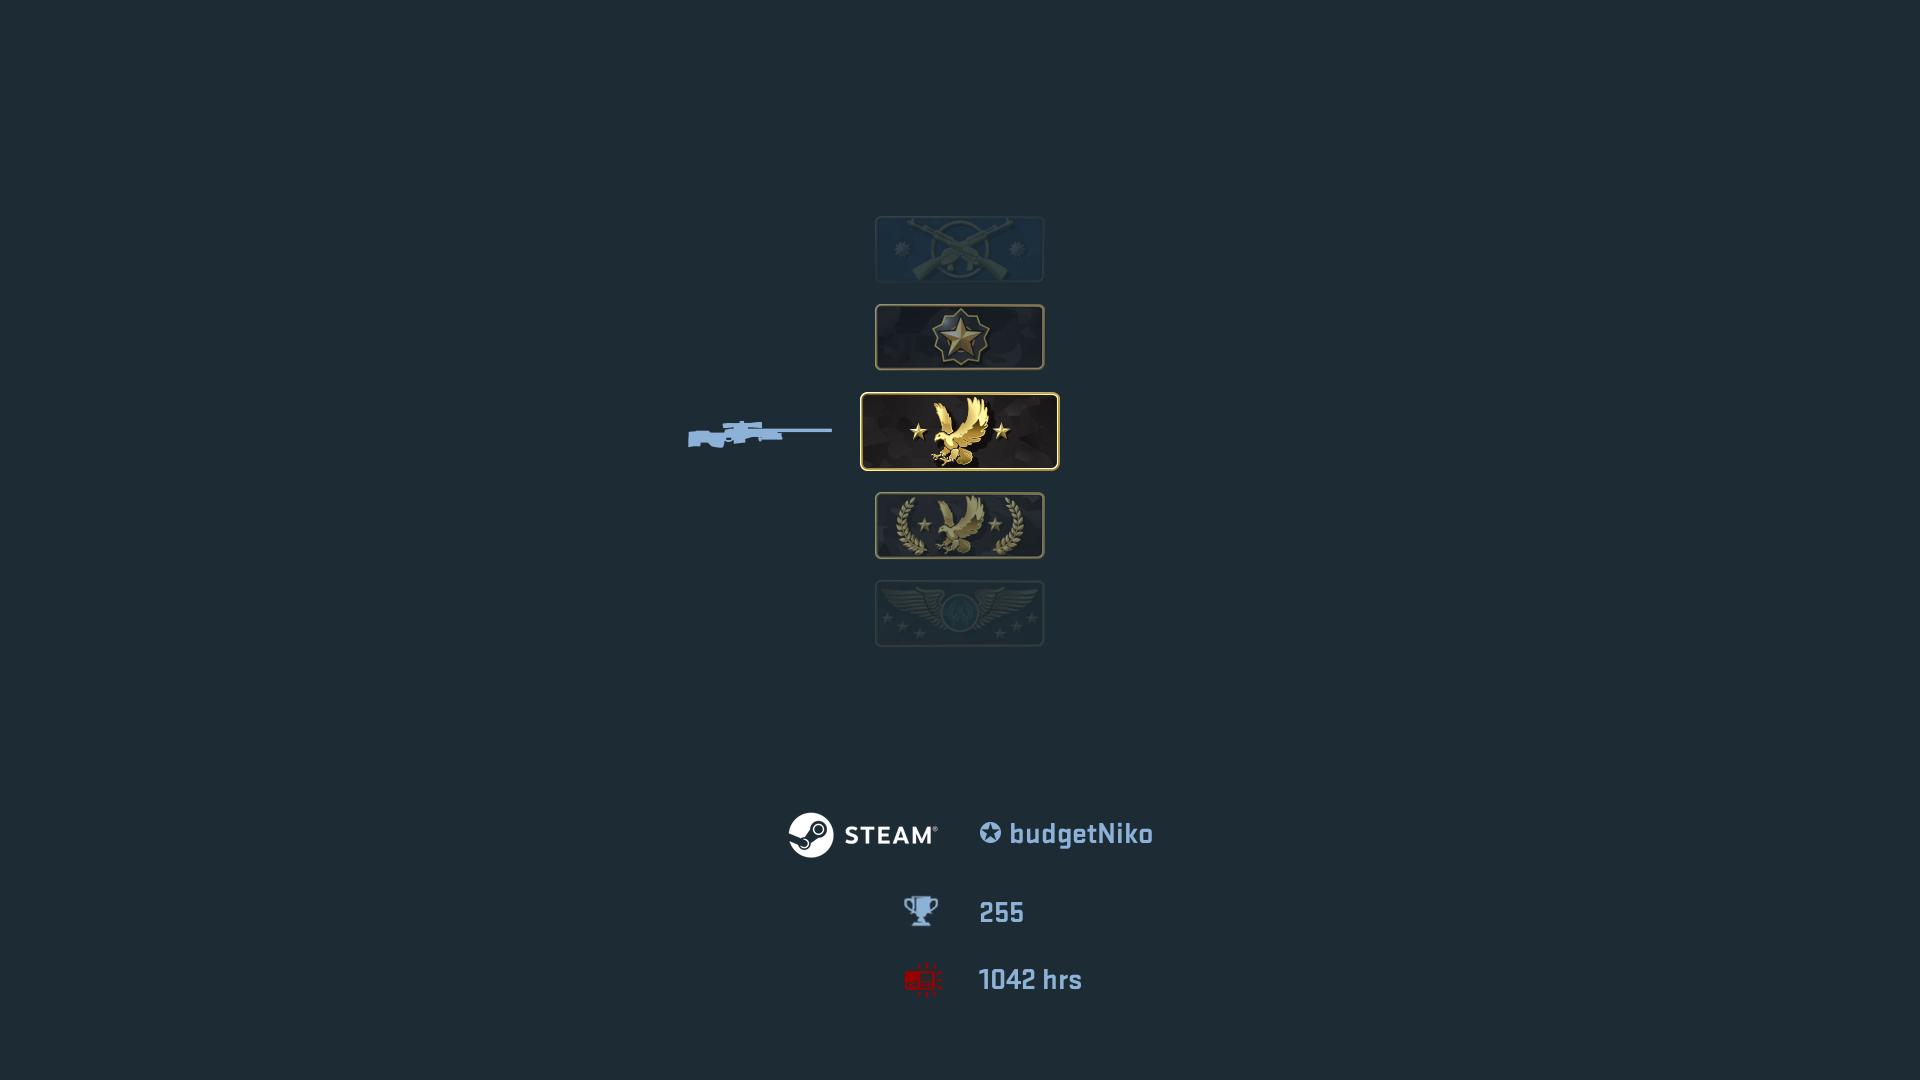 I Made My CSGO Wallpaper Games Globaloffensive Counterstrike Hltv